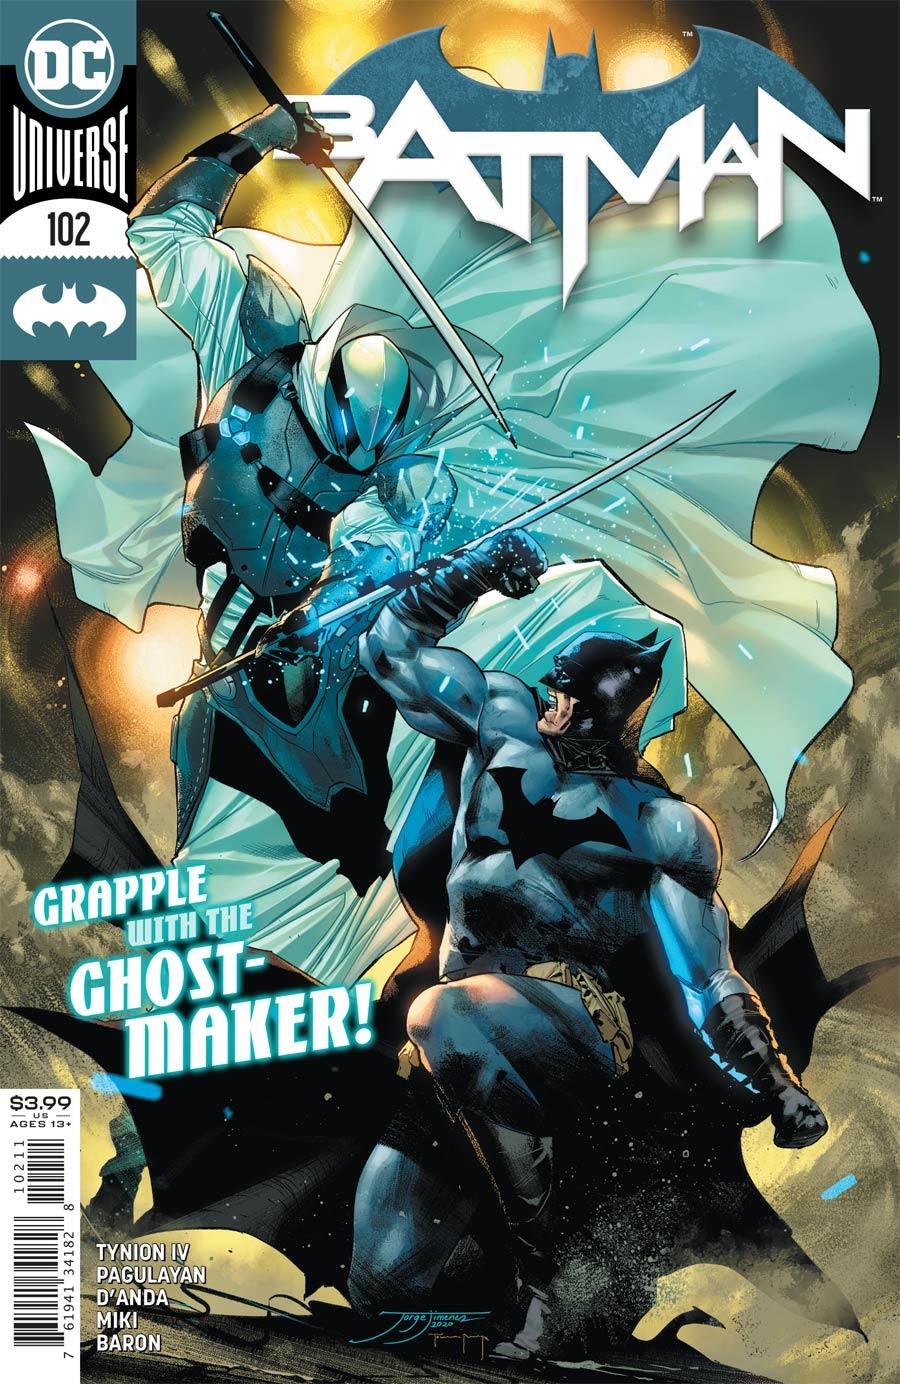 Batman Vol 3 #102 Cover A Regular Jorge Jimenez Cover